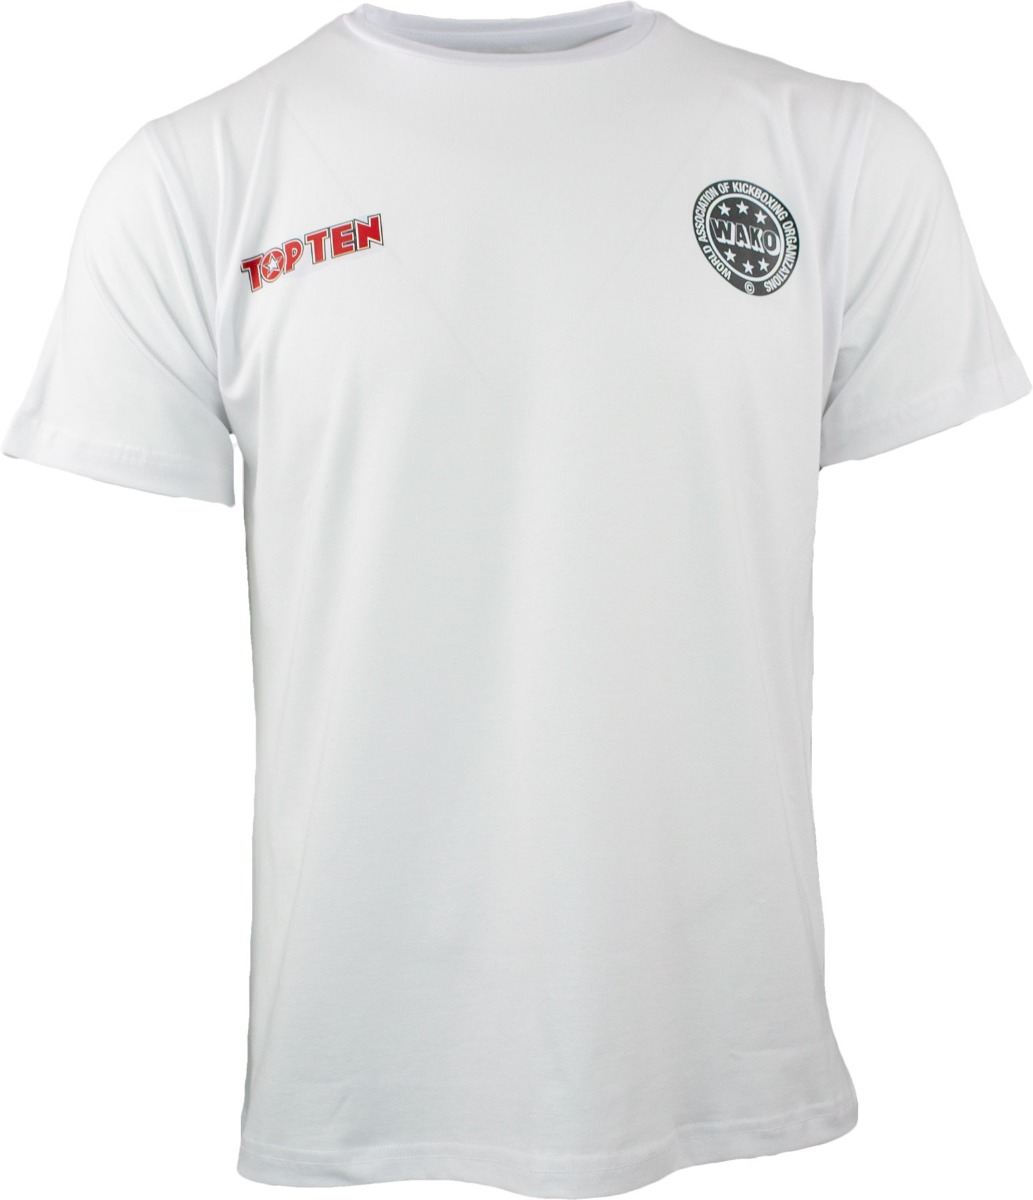 T-Shirt WAKO No. 1 Weiss Front